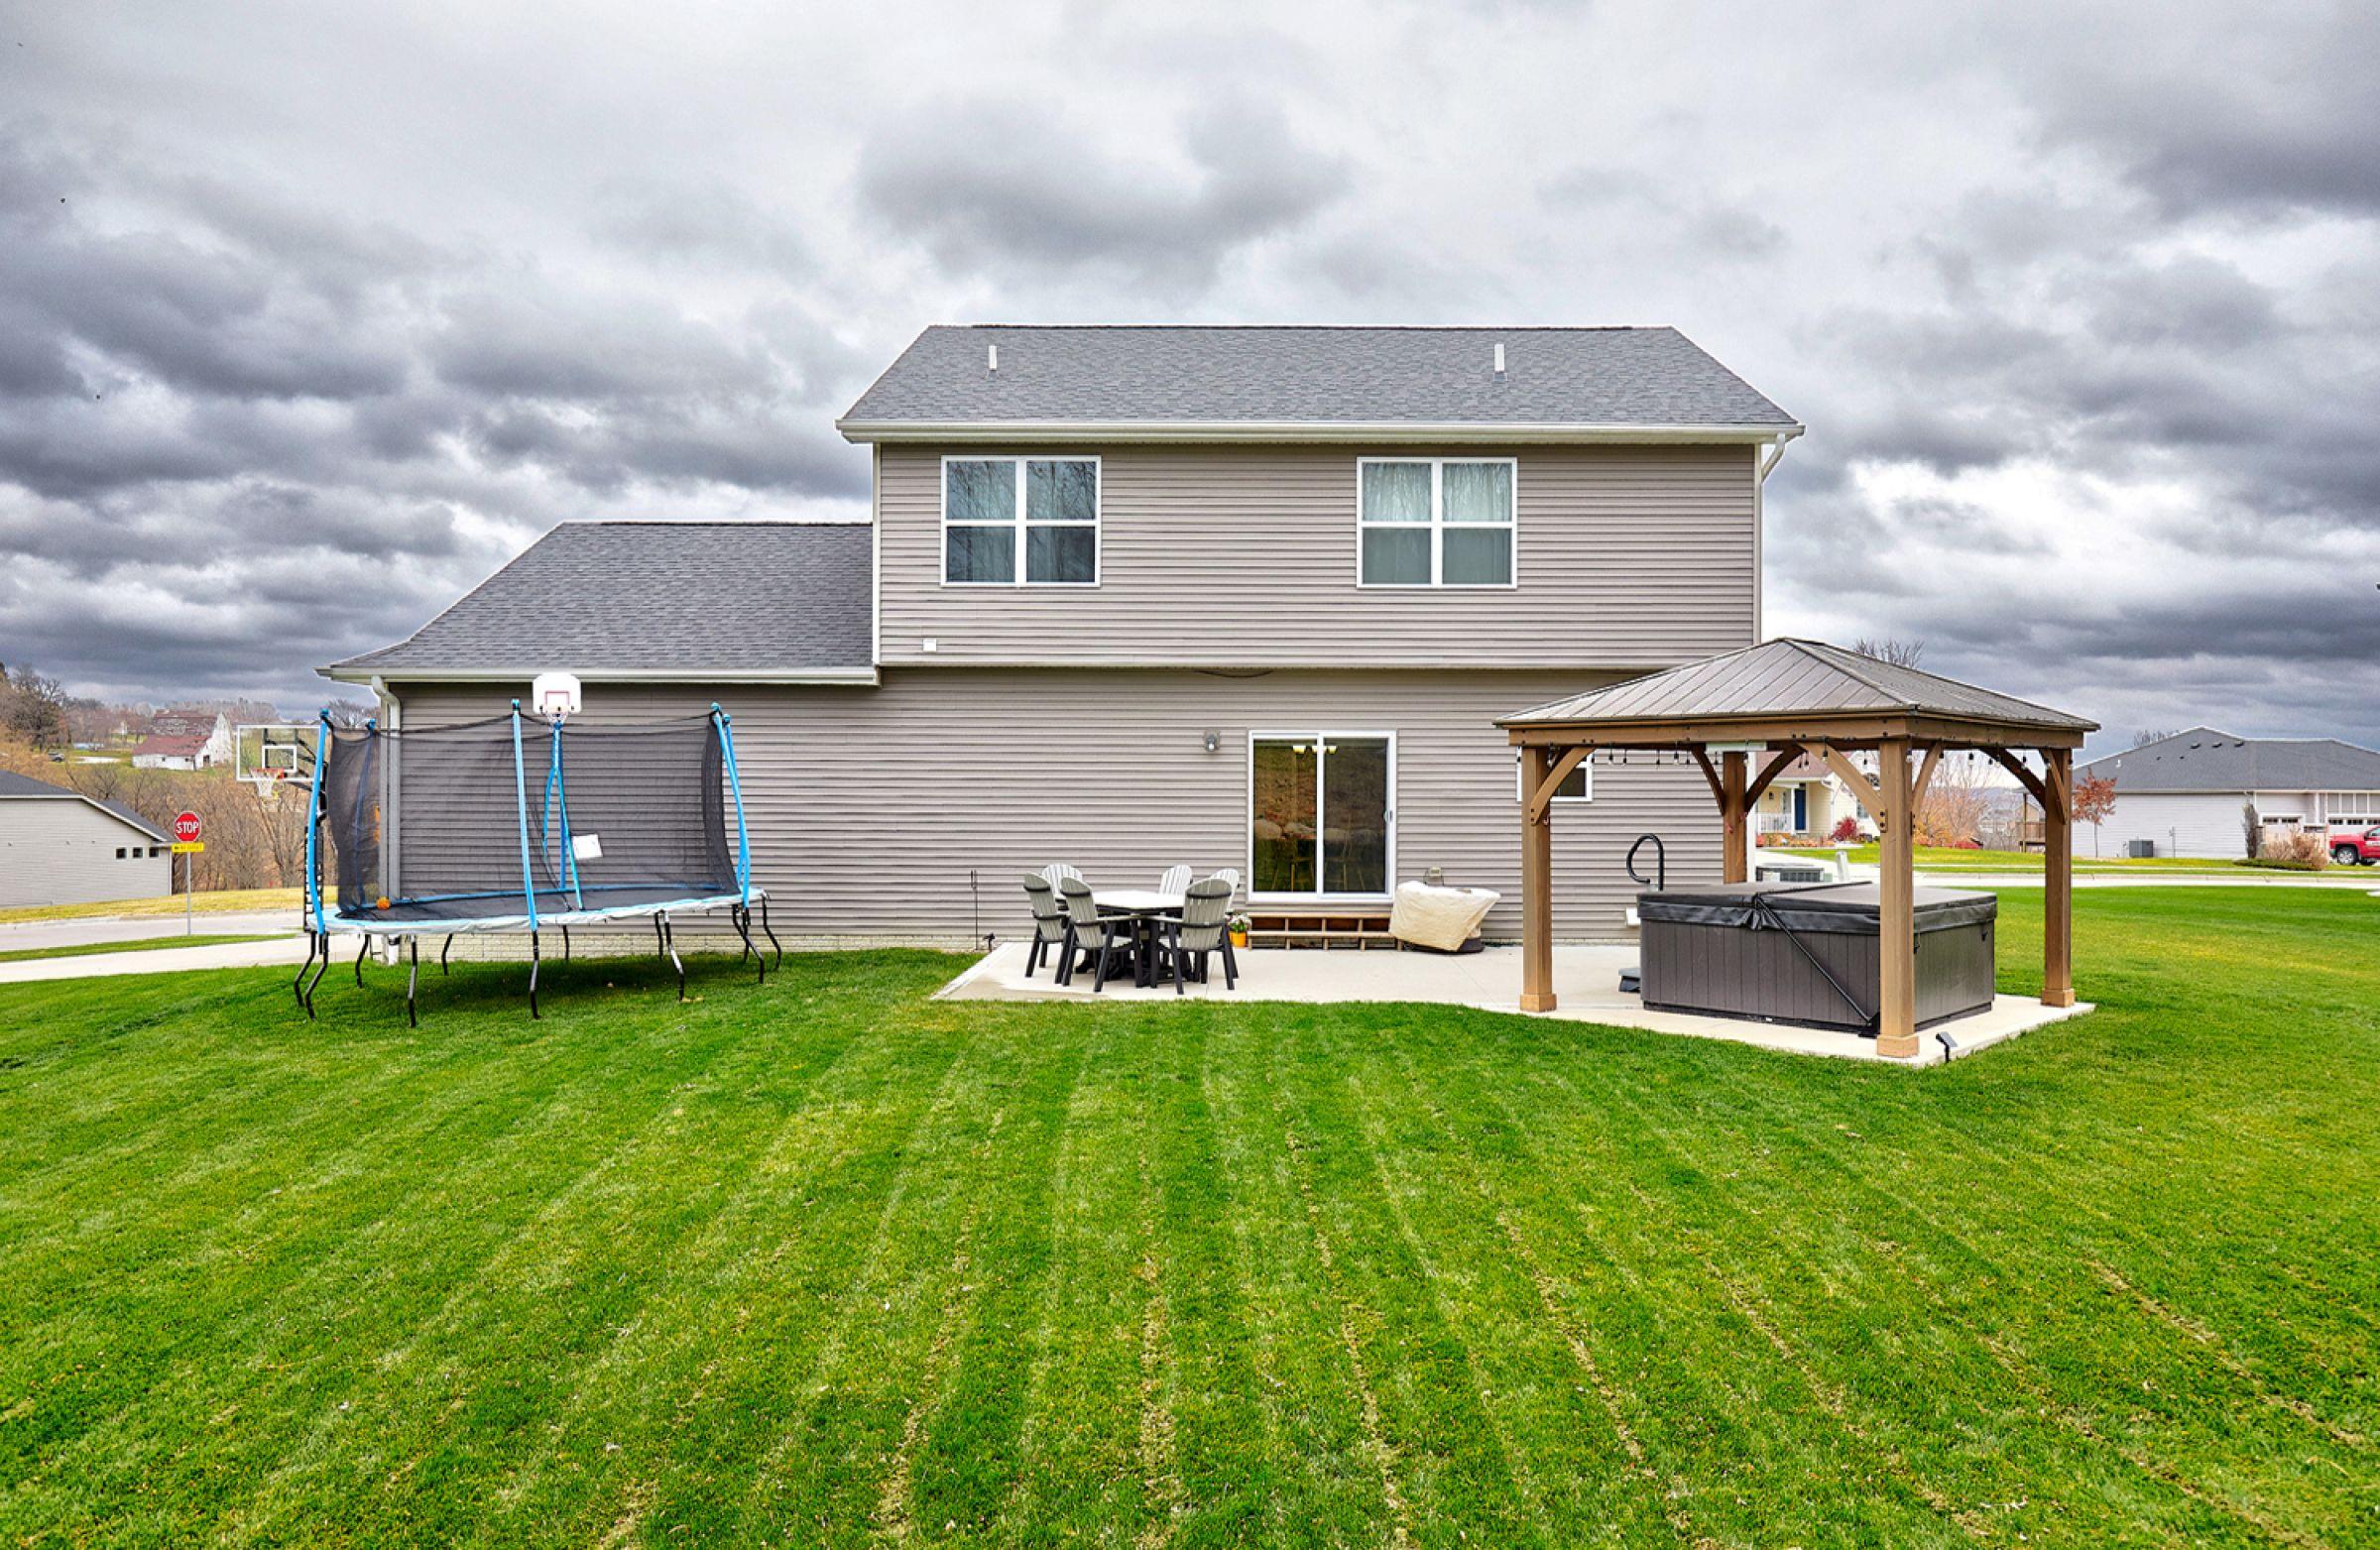 residential-warren-county-iowa-1-acres-listing-number-15254-3-2020-11-11-165802.jpg